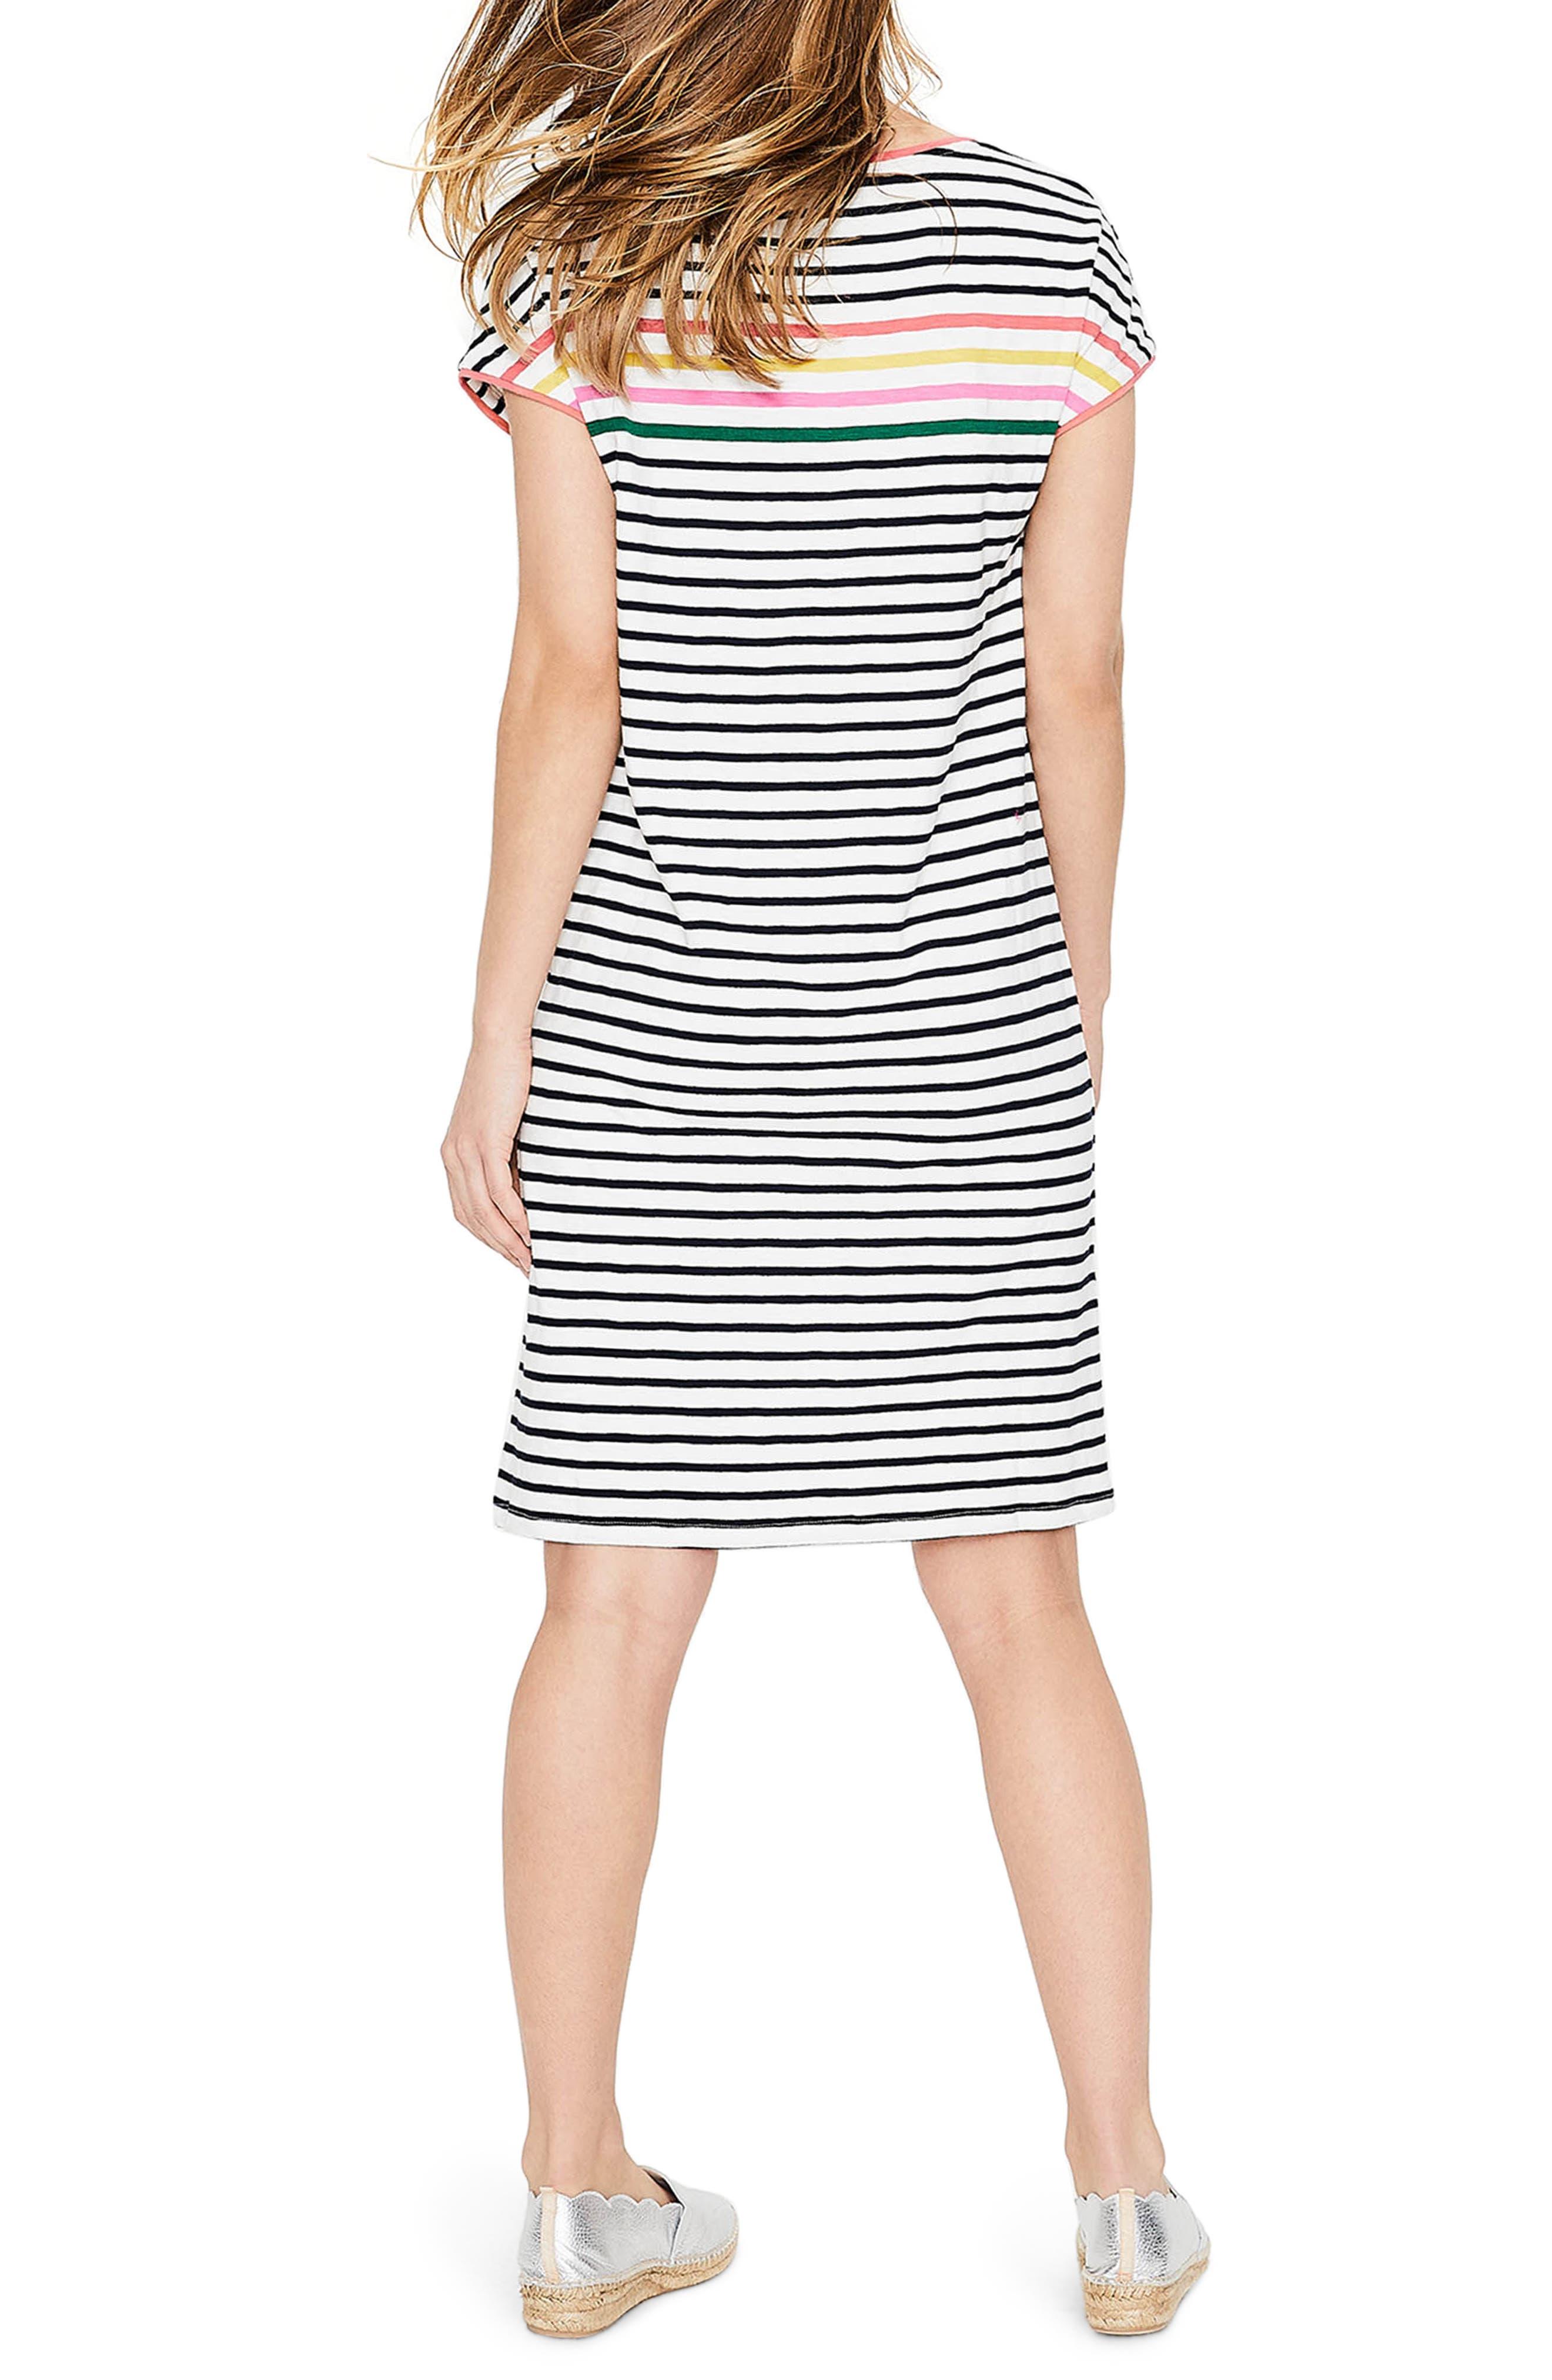 BODEN,                             Paulina Stripe T-Shirt Dress,                             Alternate thumbnail 2, color,                             186